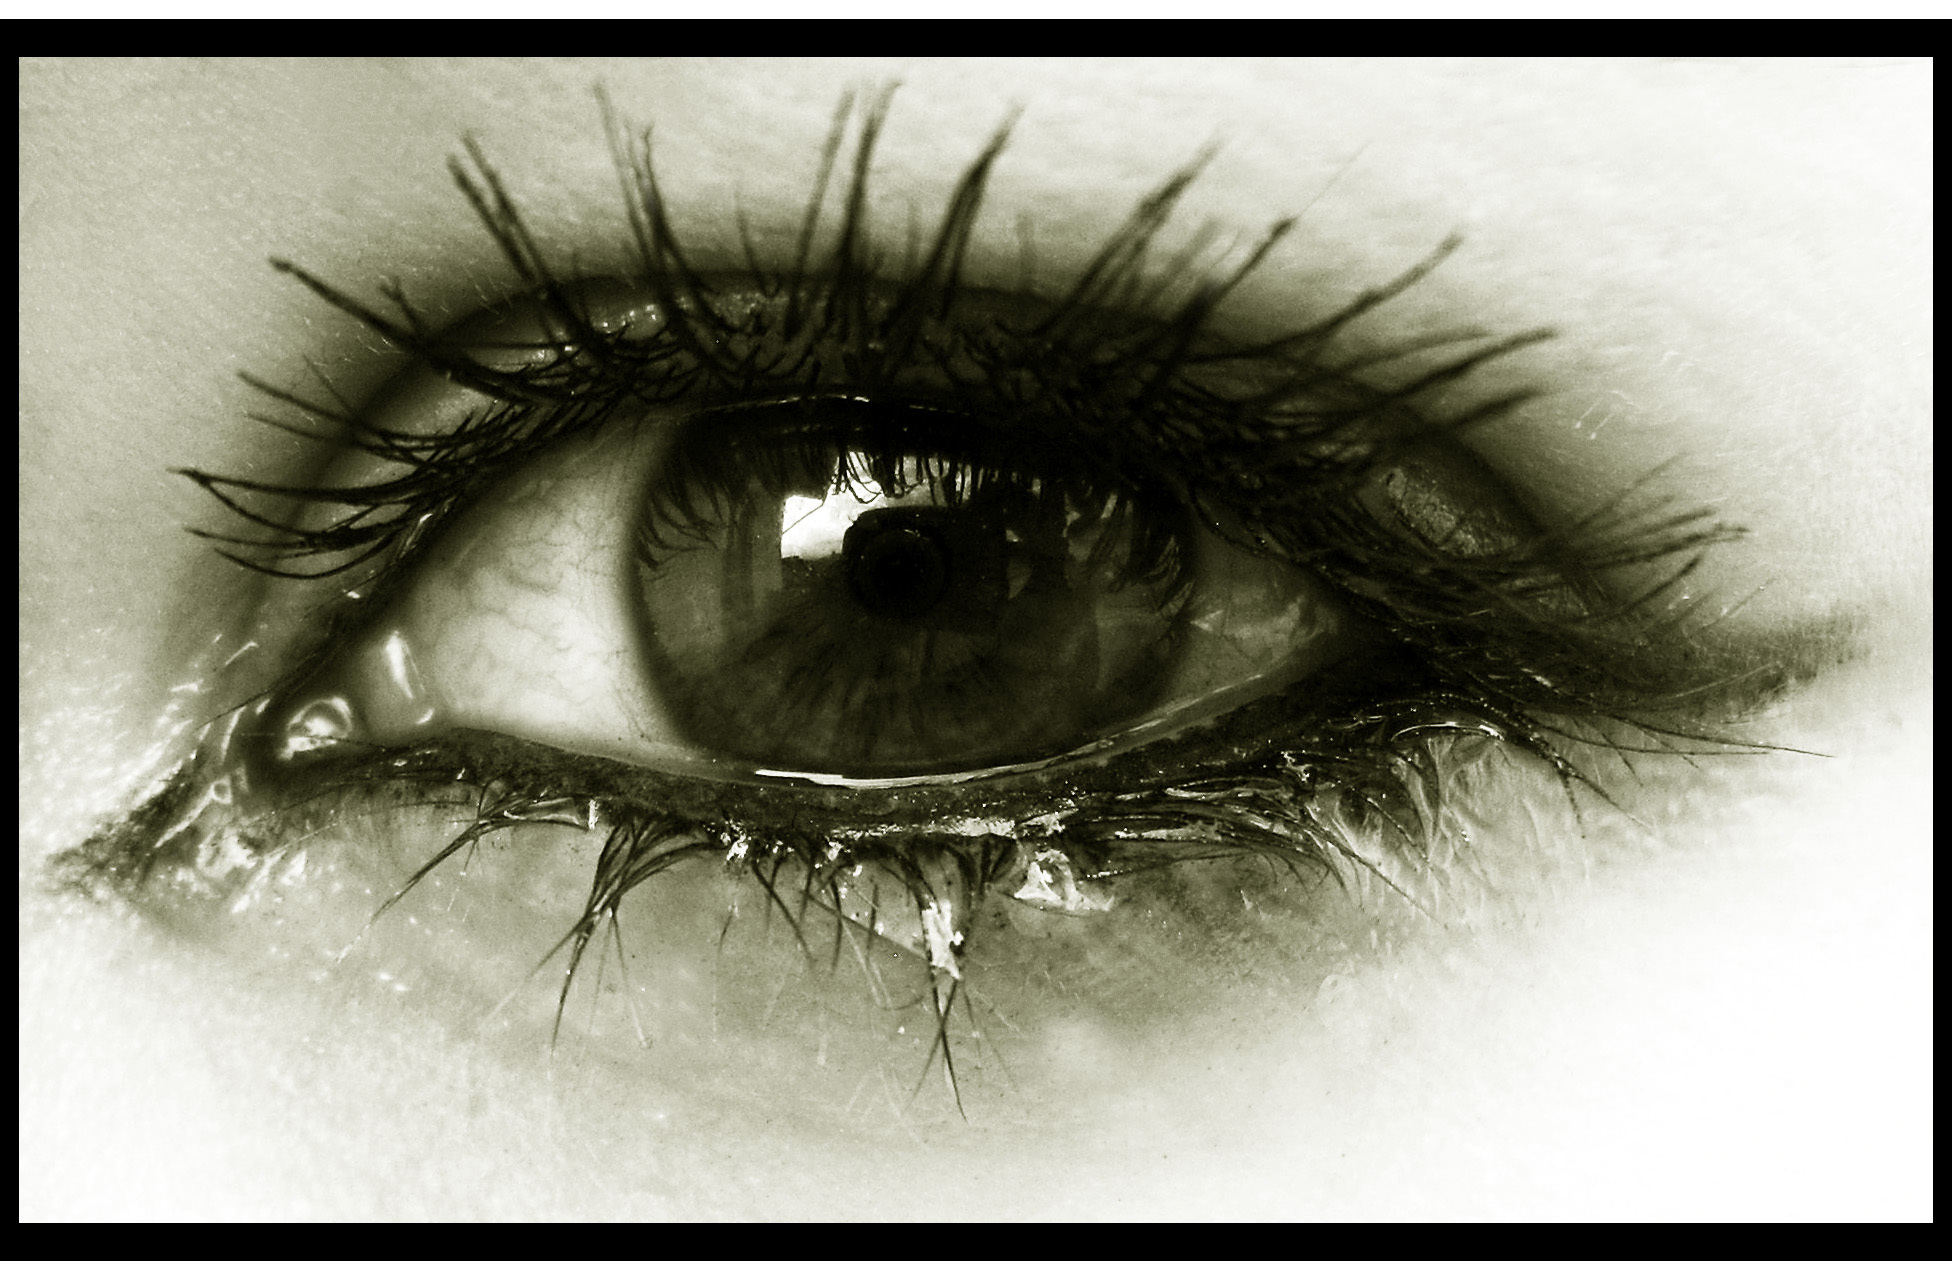 tear tears looking for some sad eyes and desktop 1952x1280 hd wallpaper 803316 - Zindagi